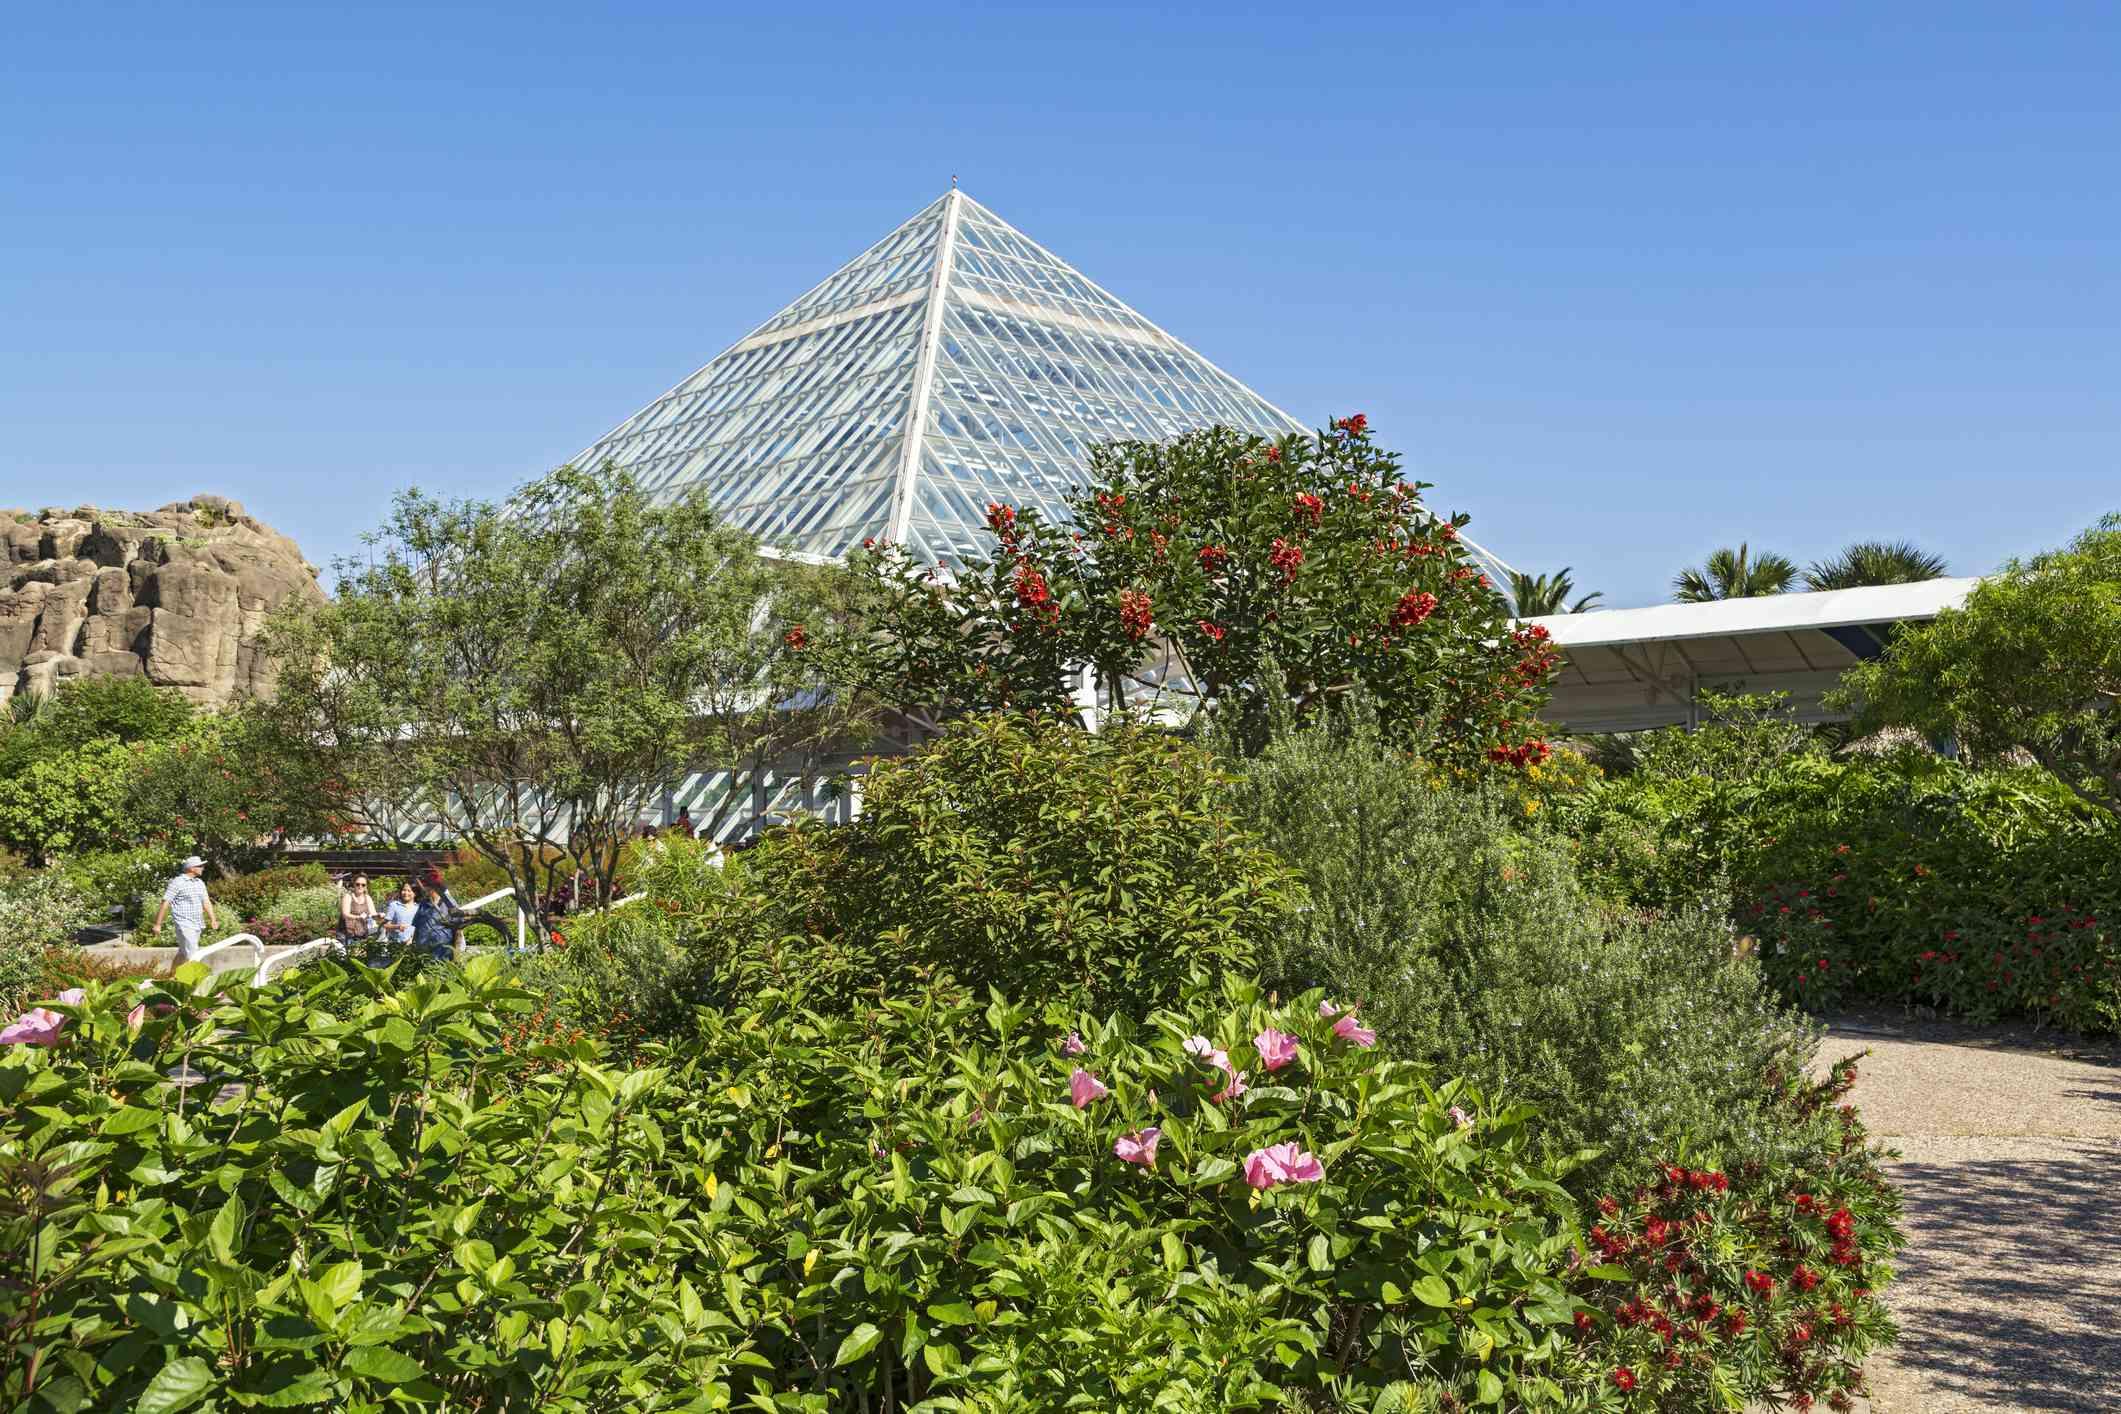 Texas, Galveston, Moody Gardens, Rainforest Pyramid